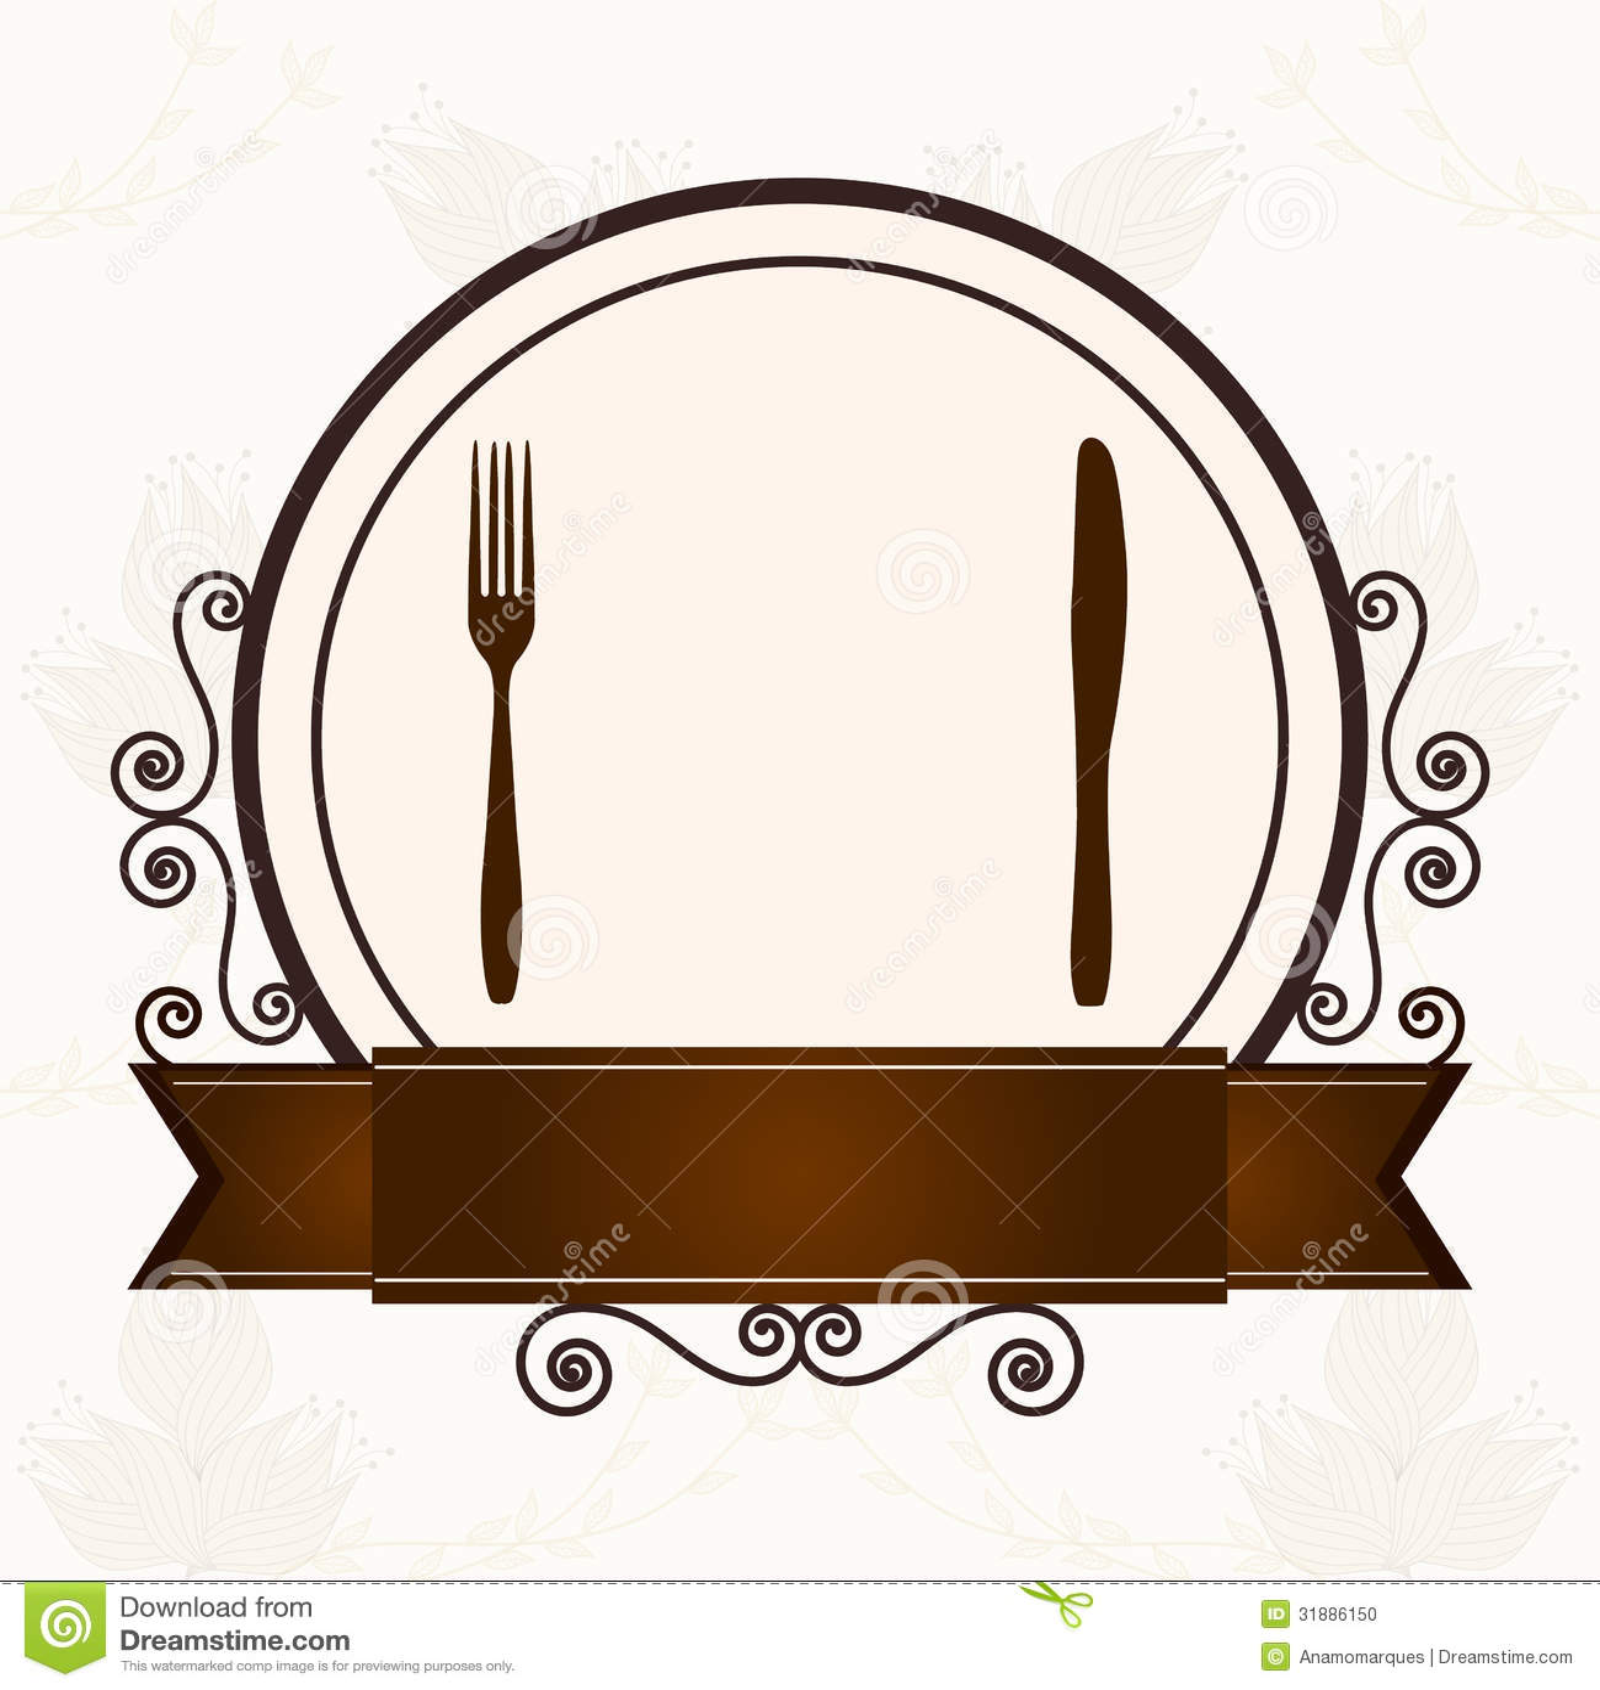 restaurant menu clipart - photo #12